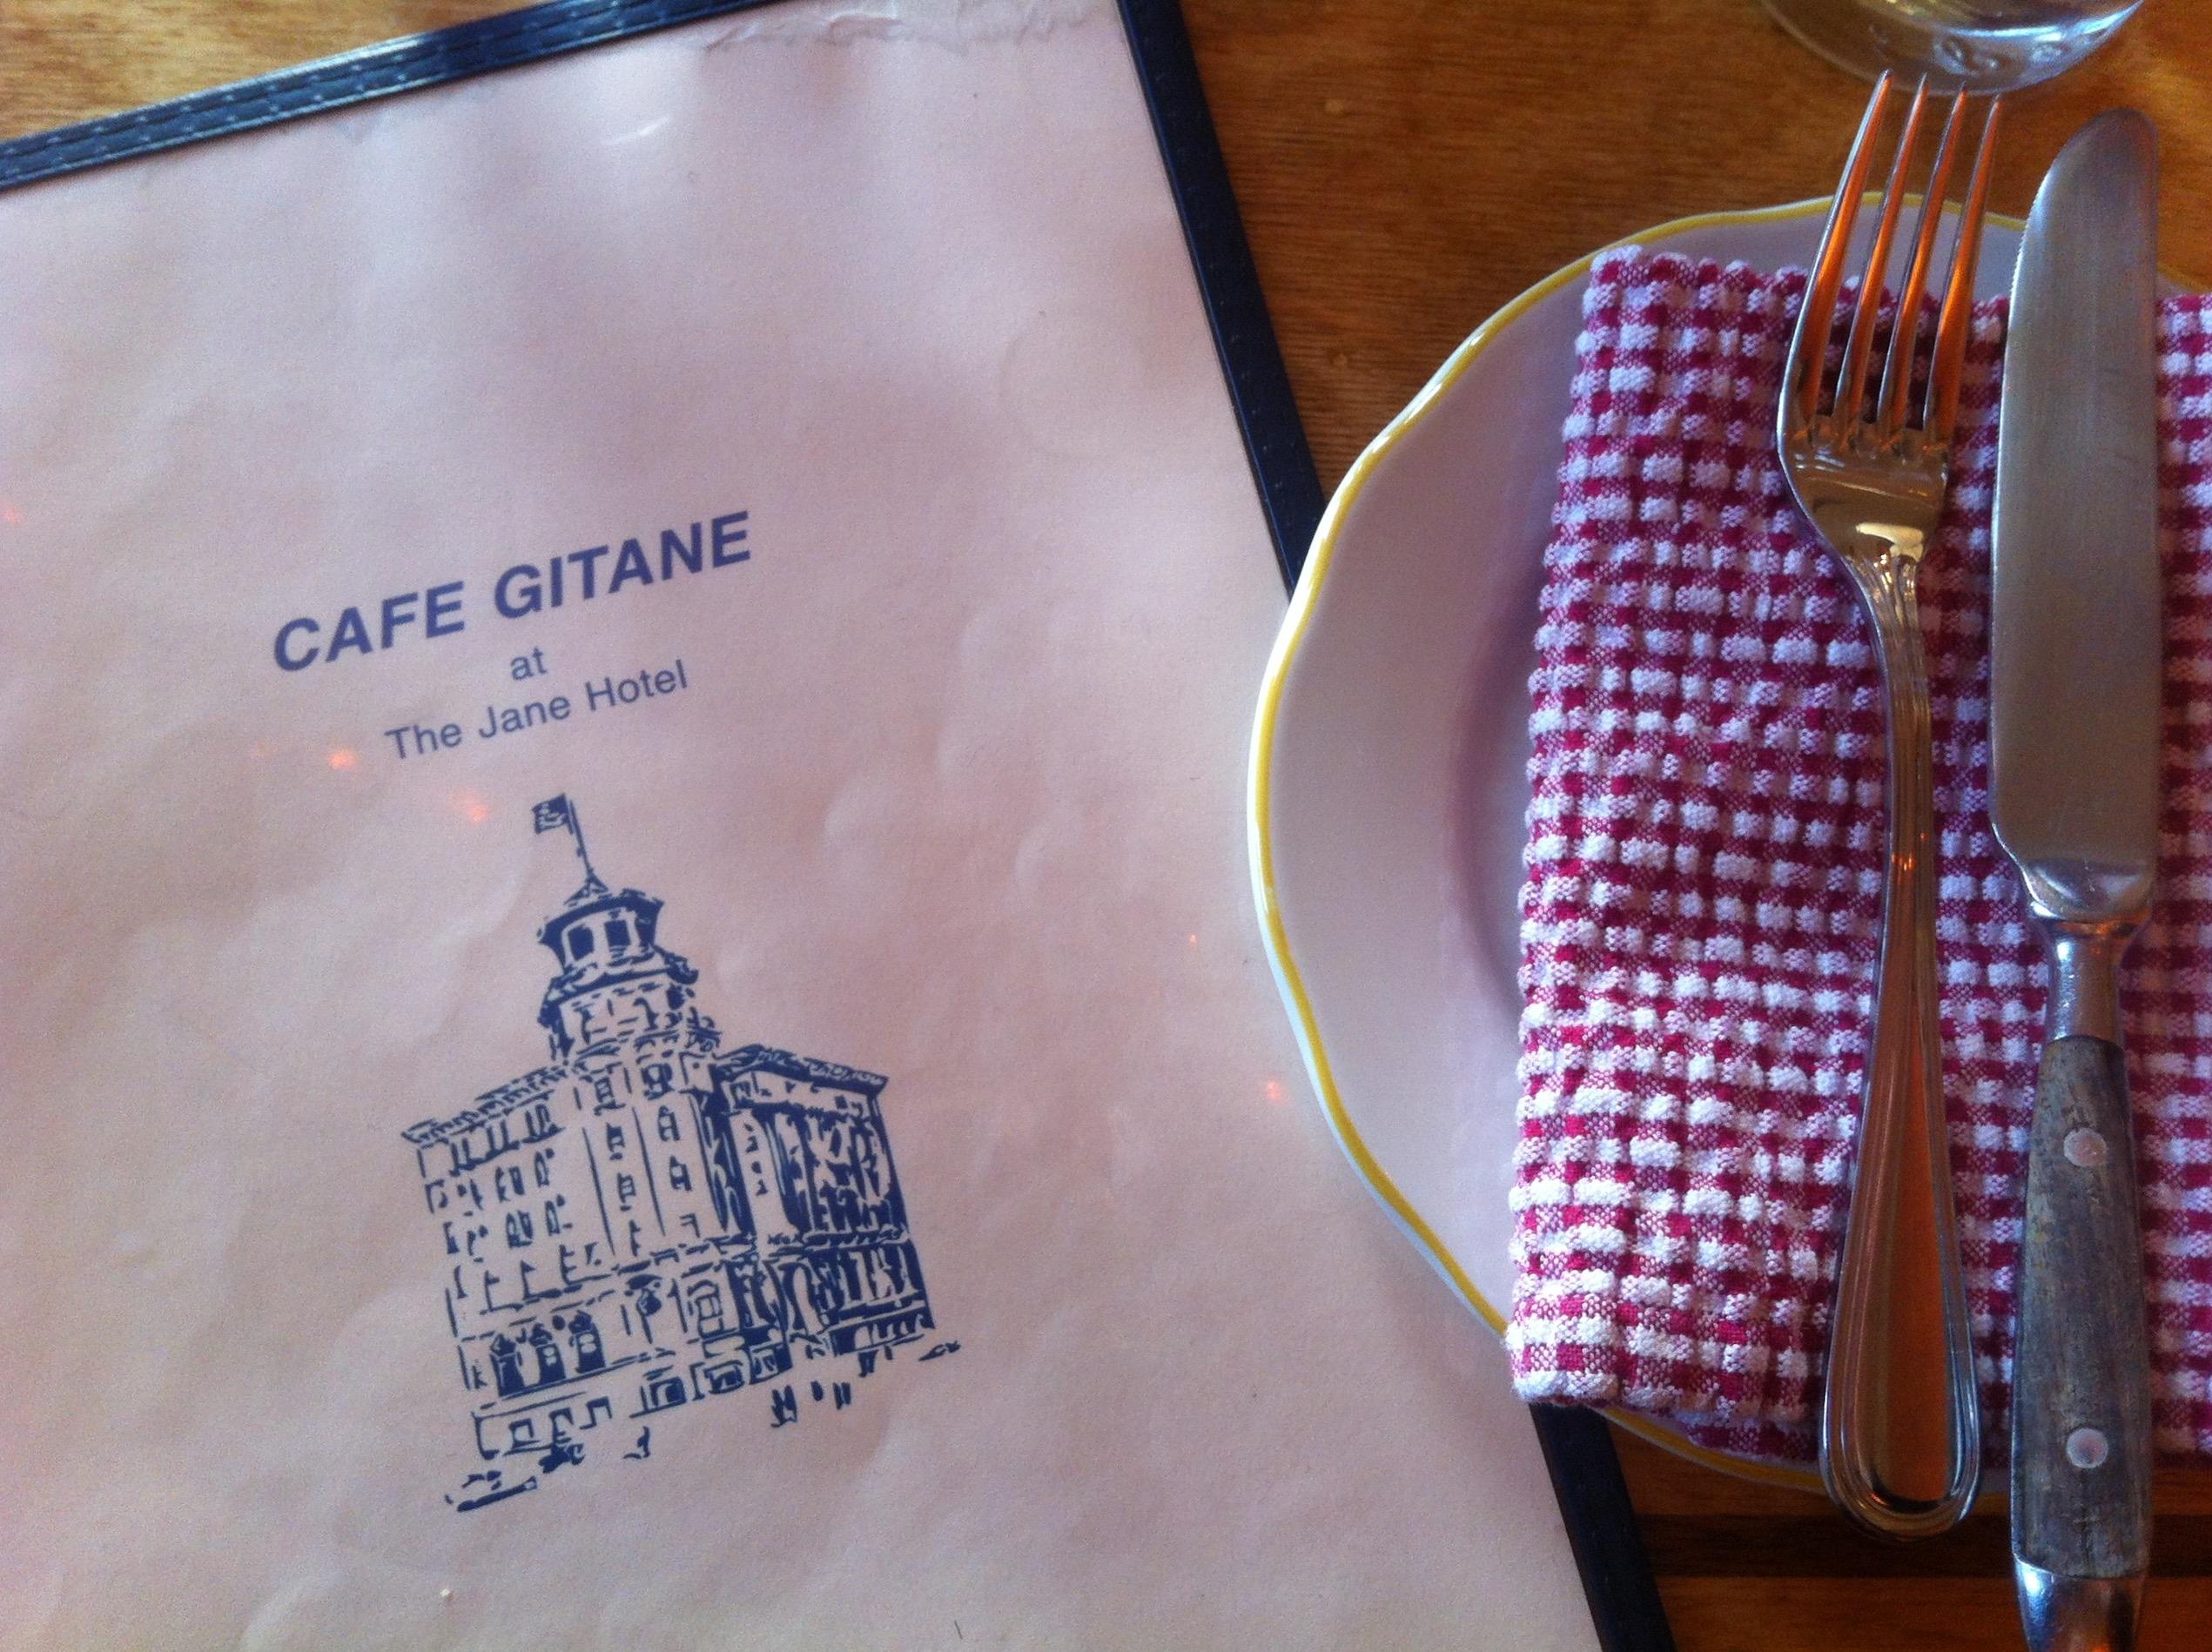 cafe gating at the jane hotel menu